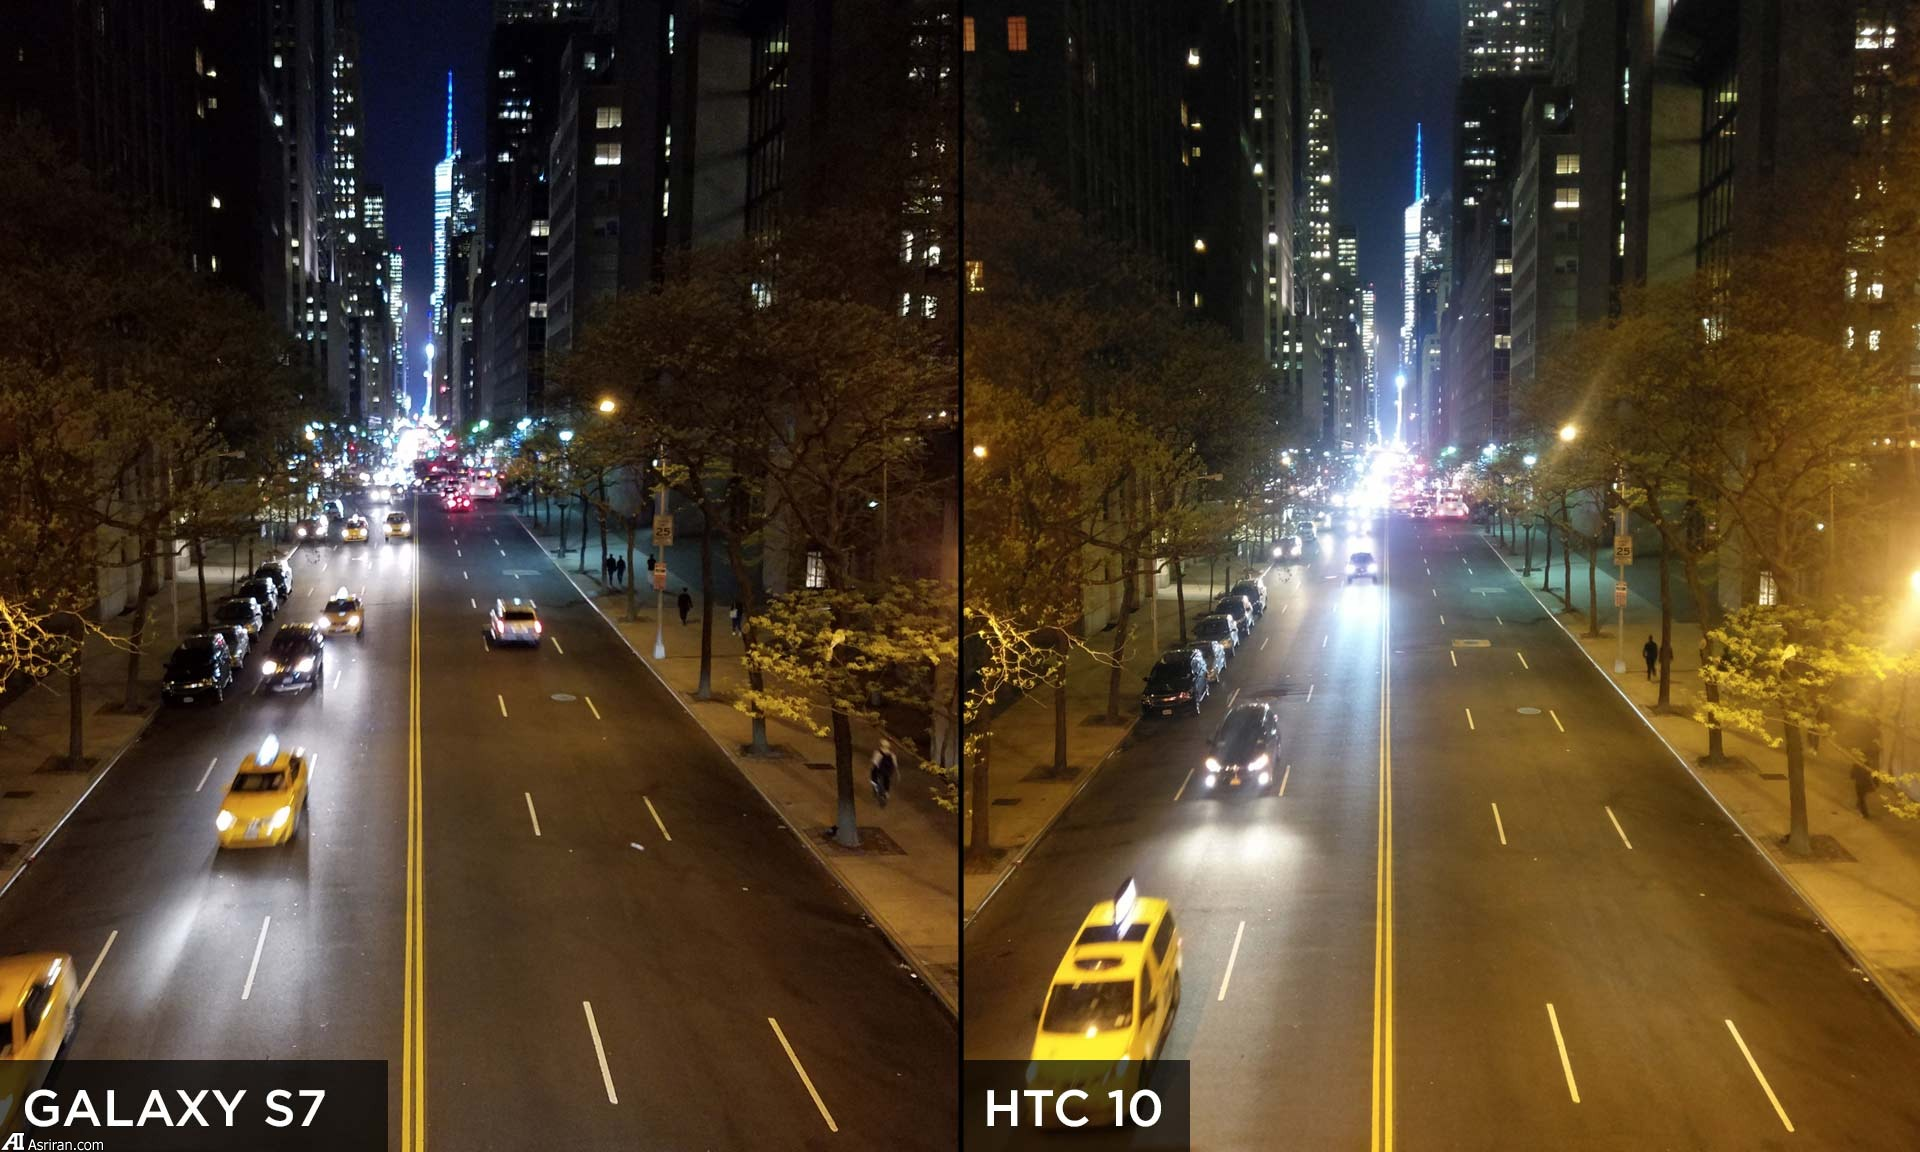 مقایسه دوربین سامسونگ گلکسی S7 و اچتیسی 10